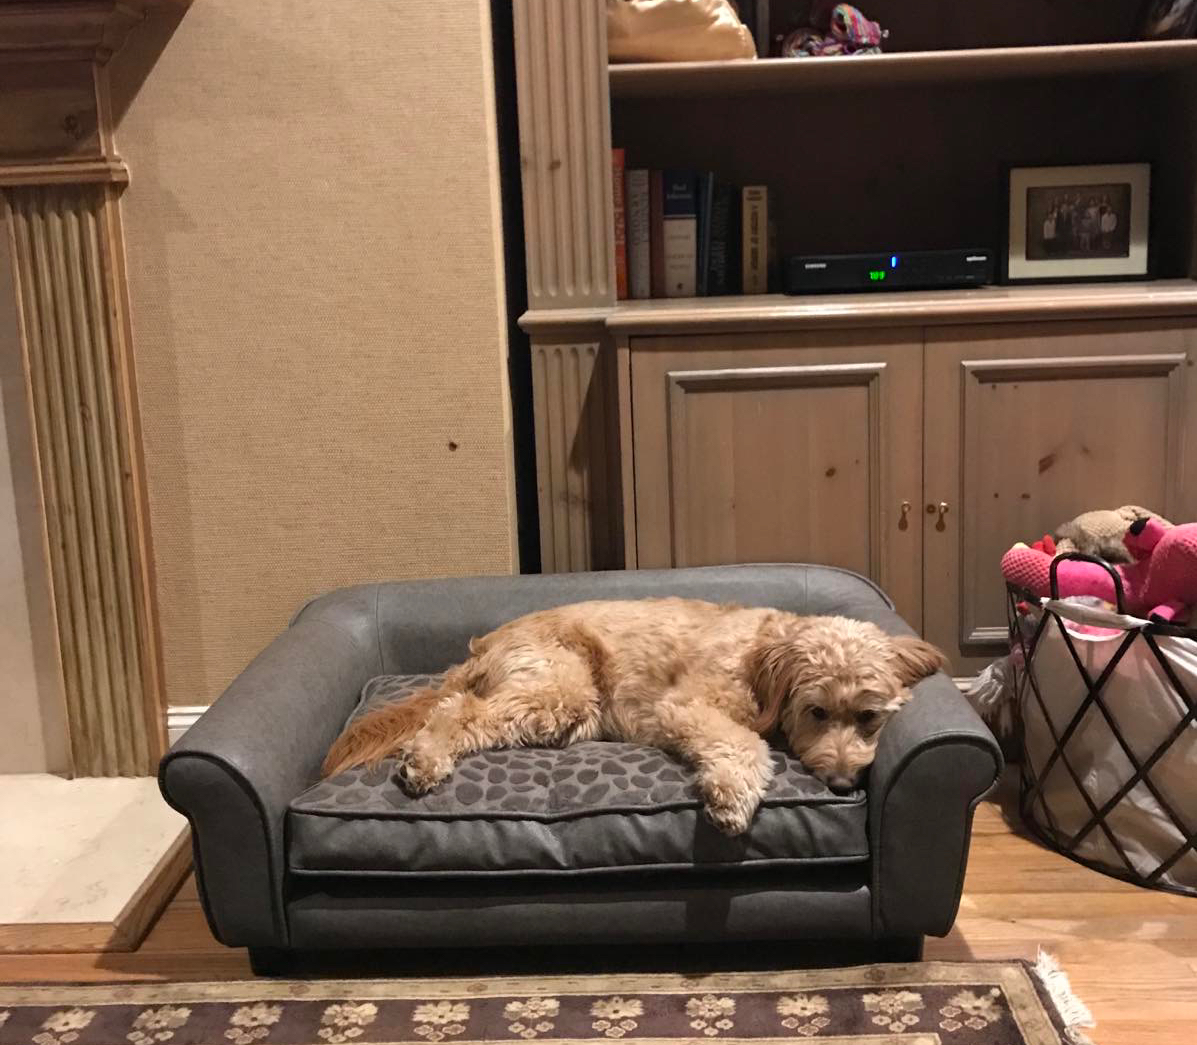 Happy Monday! 2 hour delay for Sadie! #thedisabilityguysdogs  #bernedoodle #goldendoodle https://t.co/EBxLSFCE8c